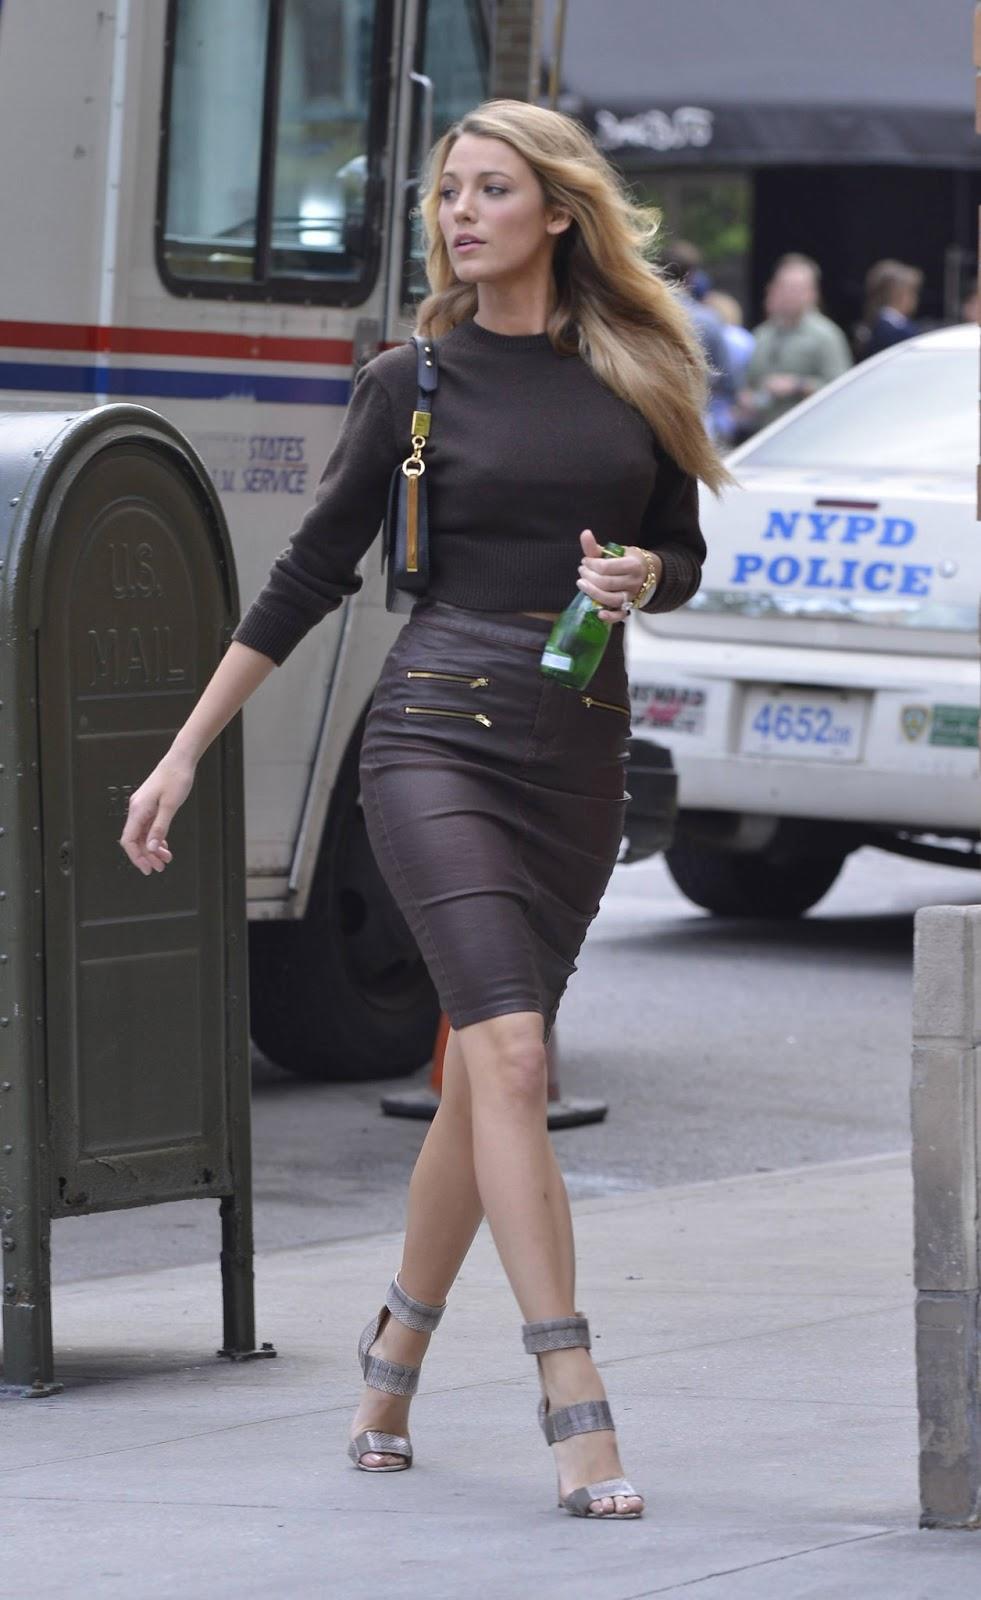 Trends fashion denim skirts make a comeback, ??????, ??? ????????? ???????